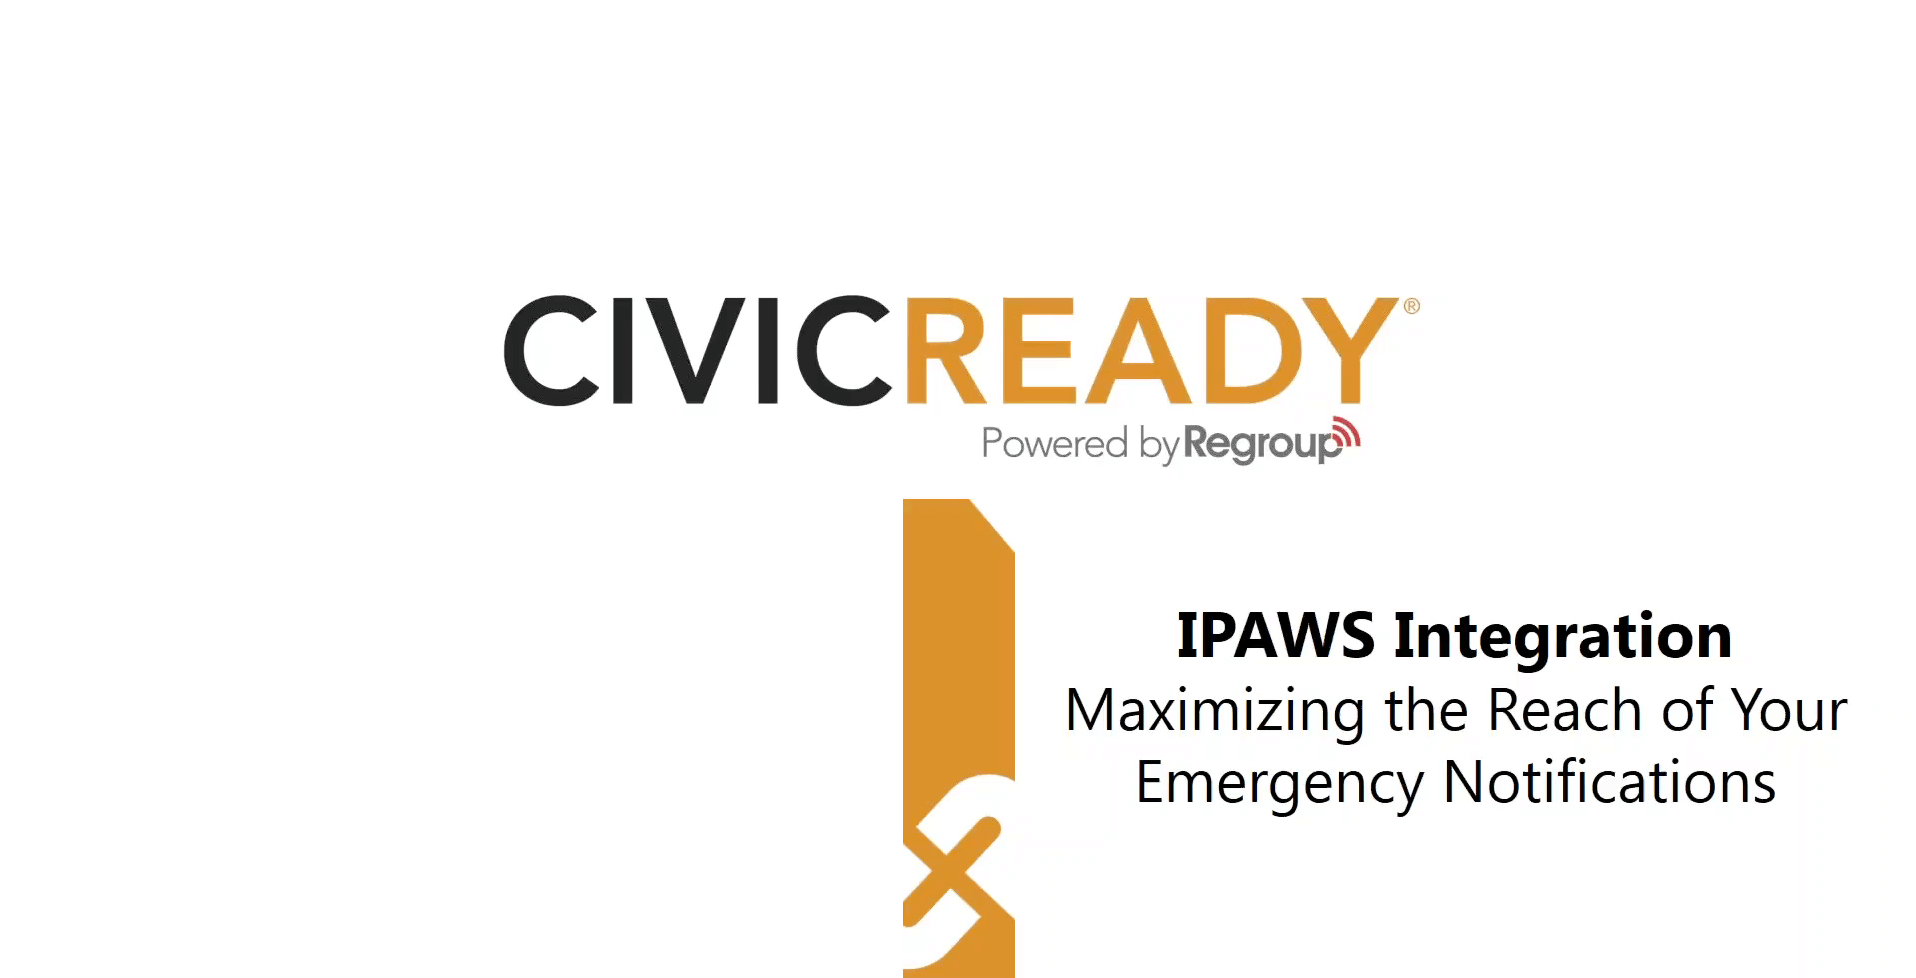 Harness the Life Saving Power of IPAWS